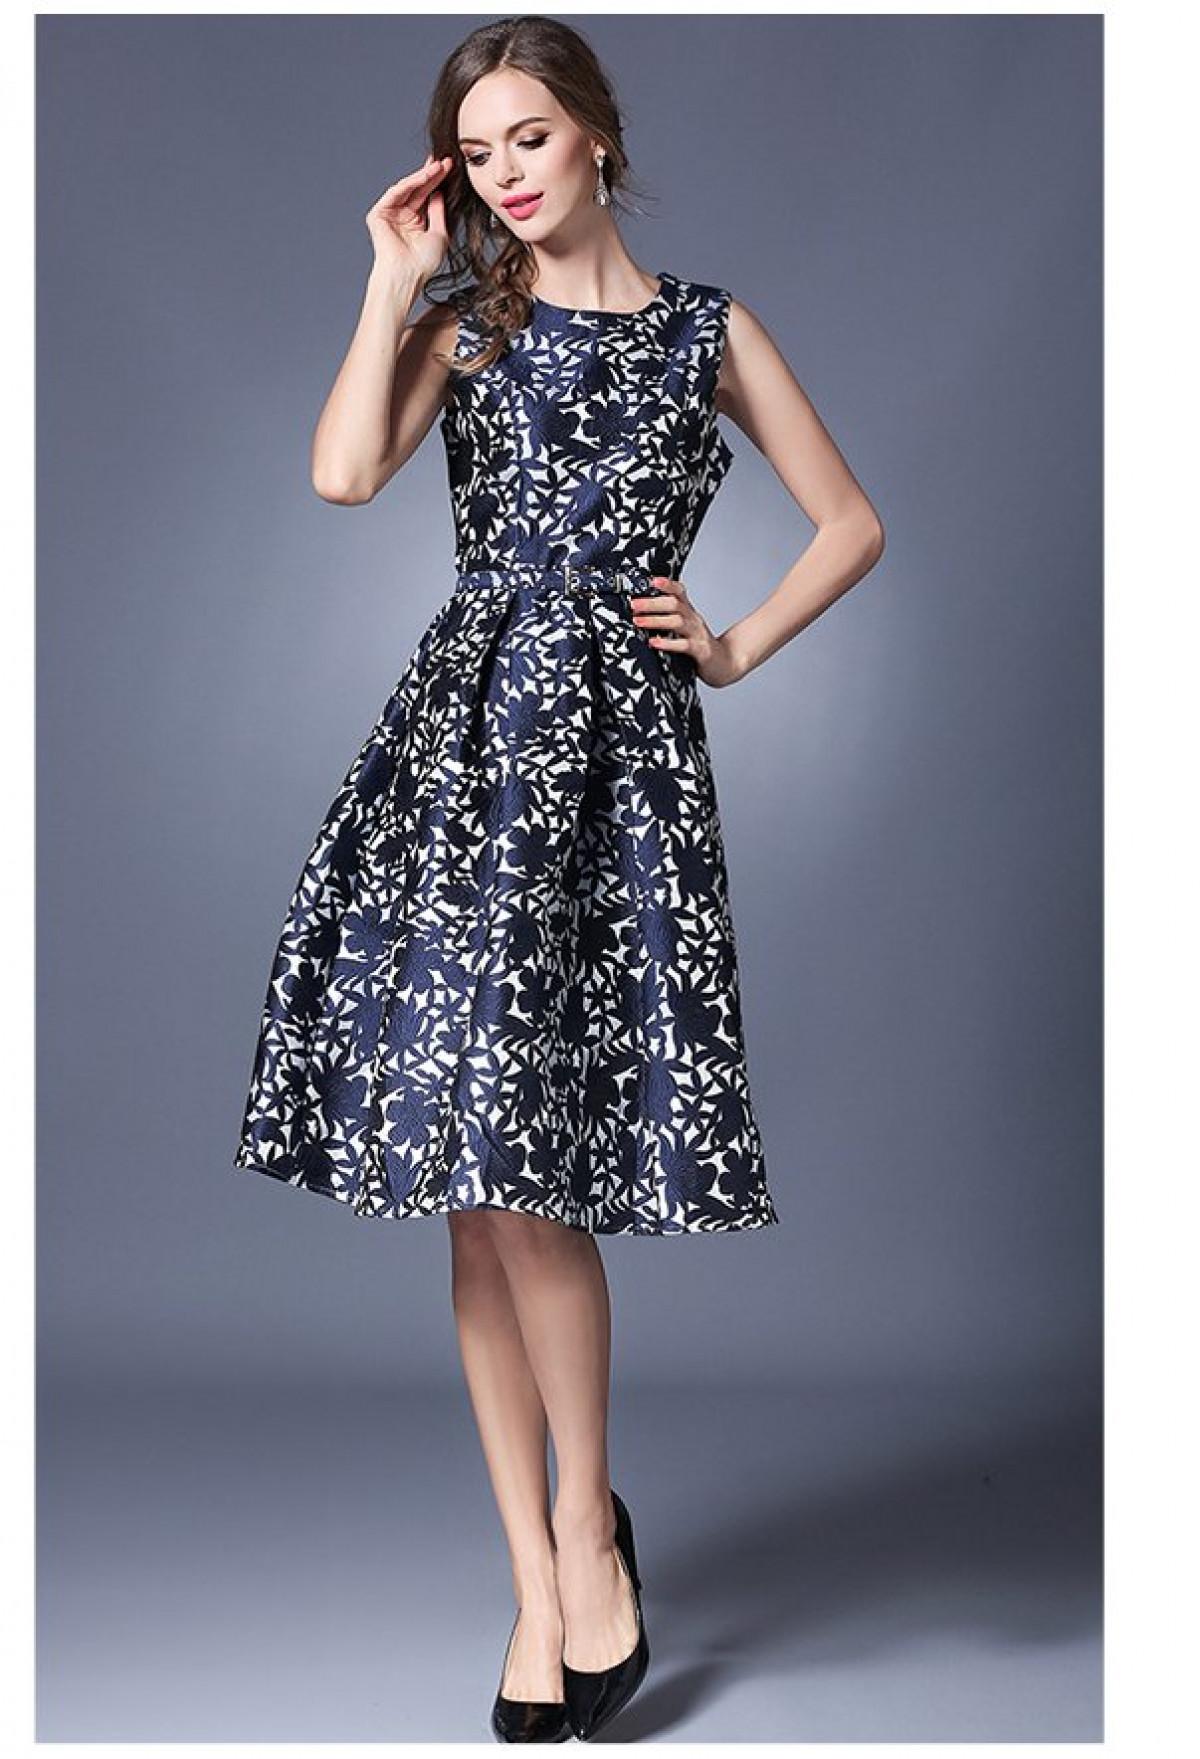 Des Robes Chics Habillees Elegantes Pour Working Girls